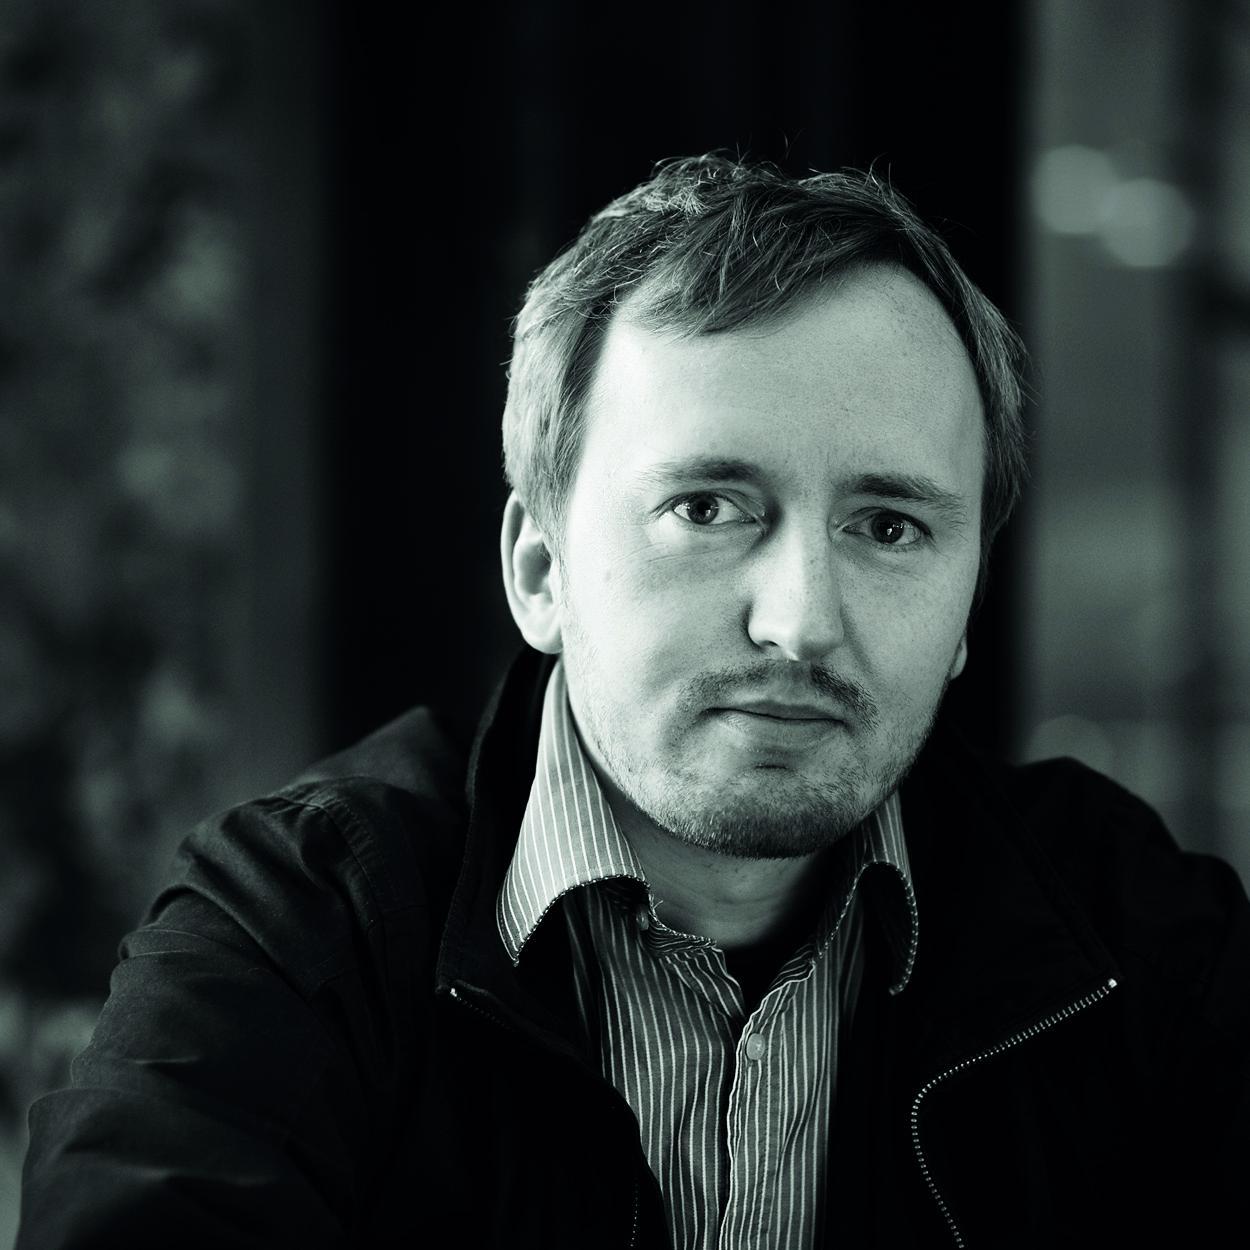 Rune Berglund Steen